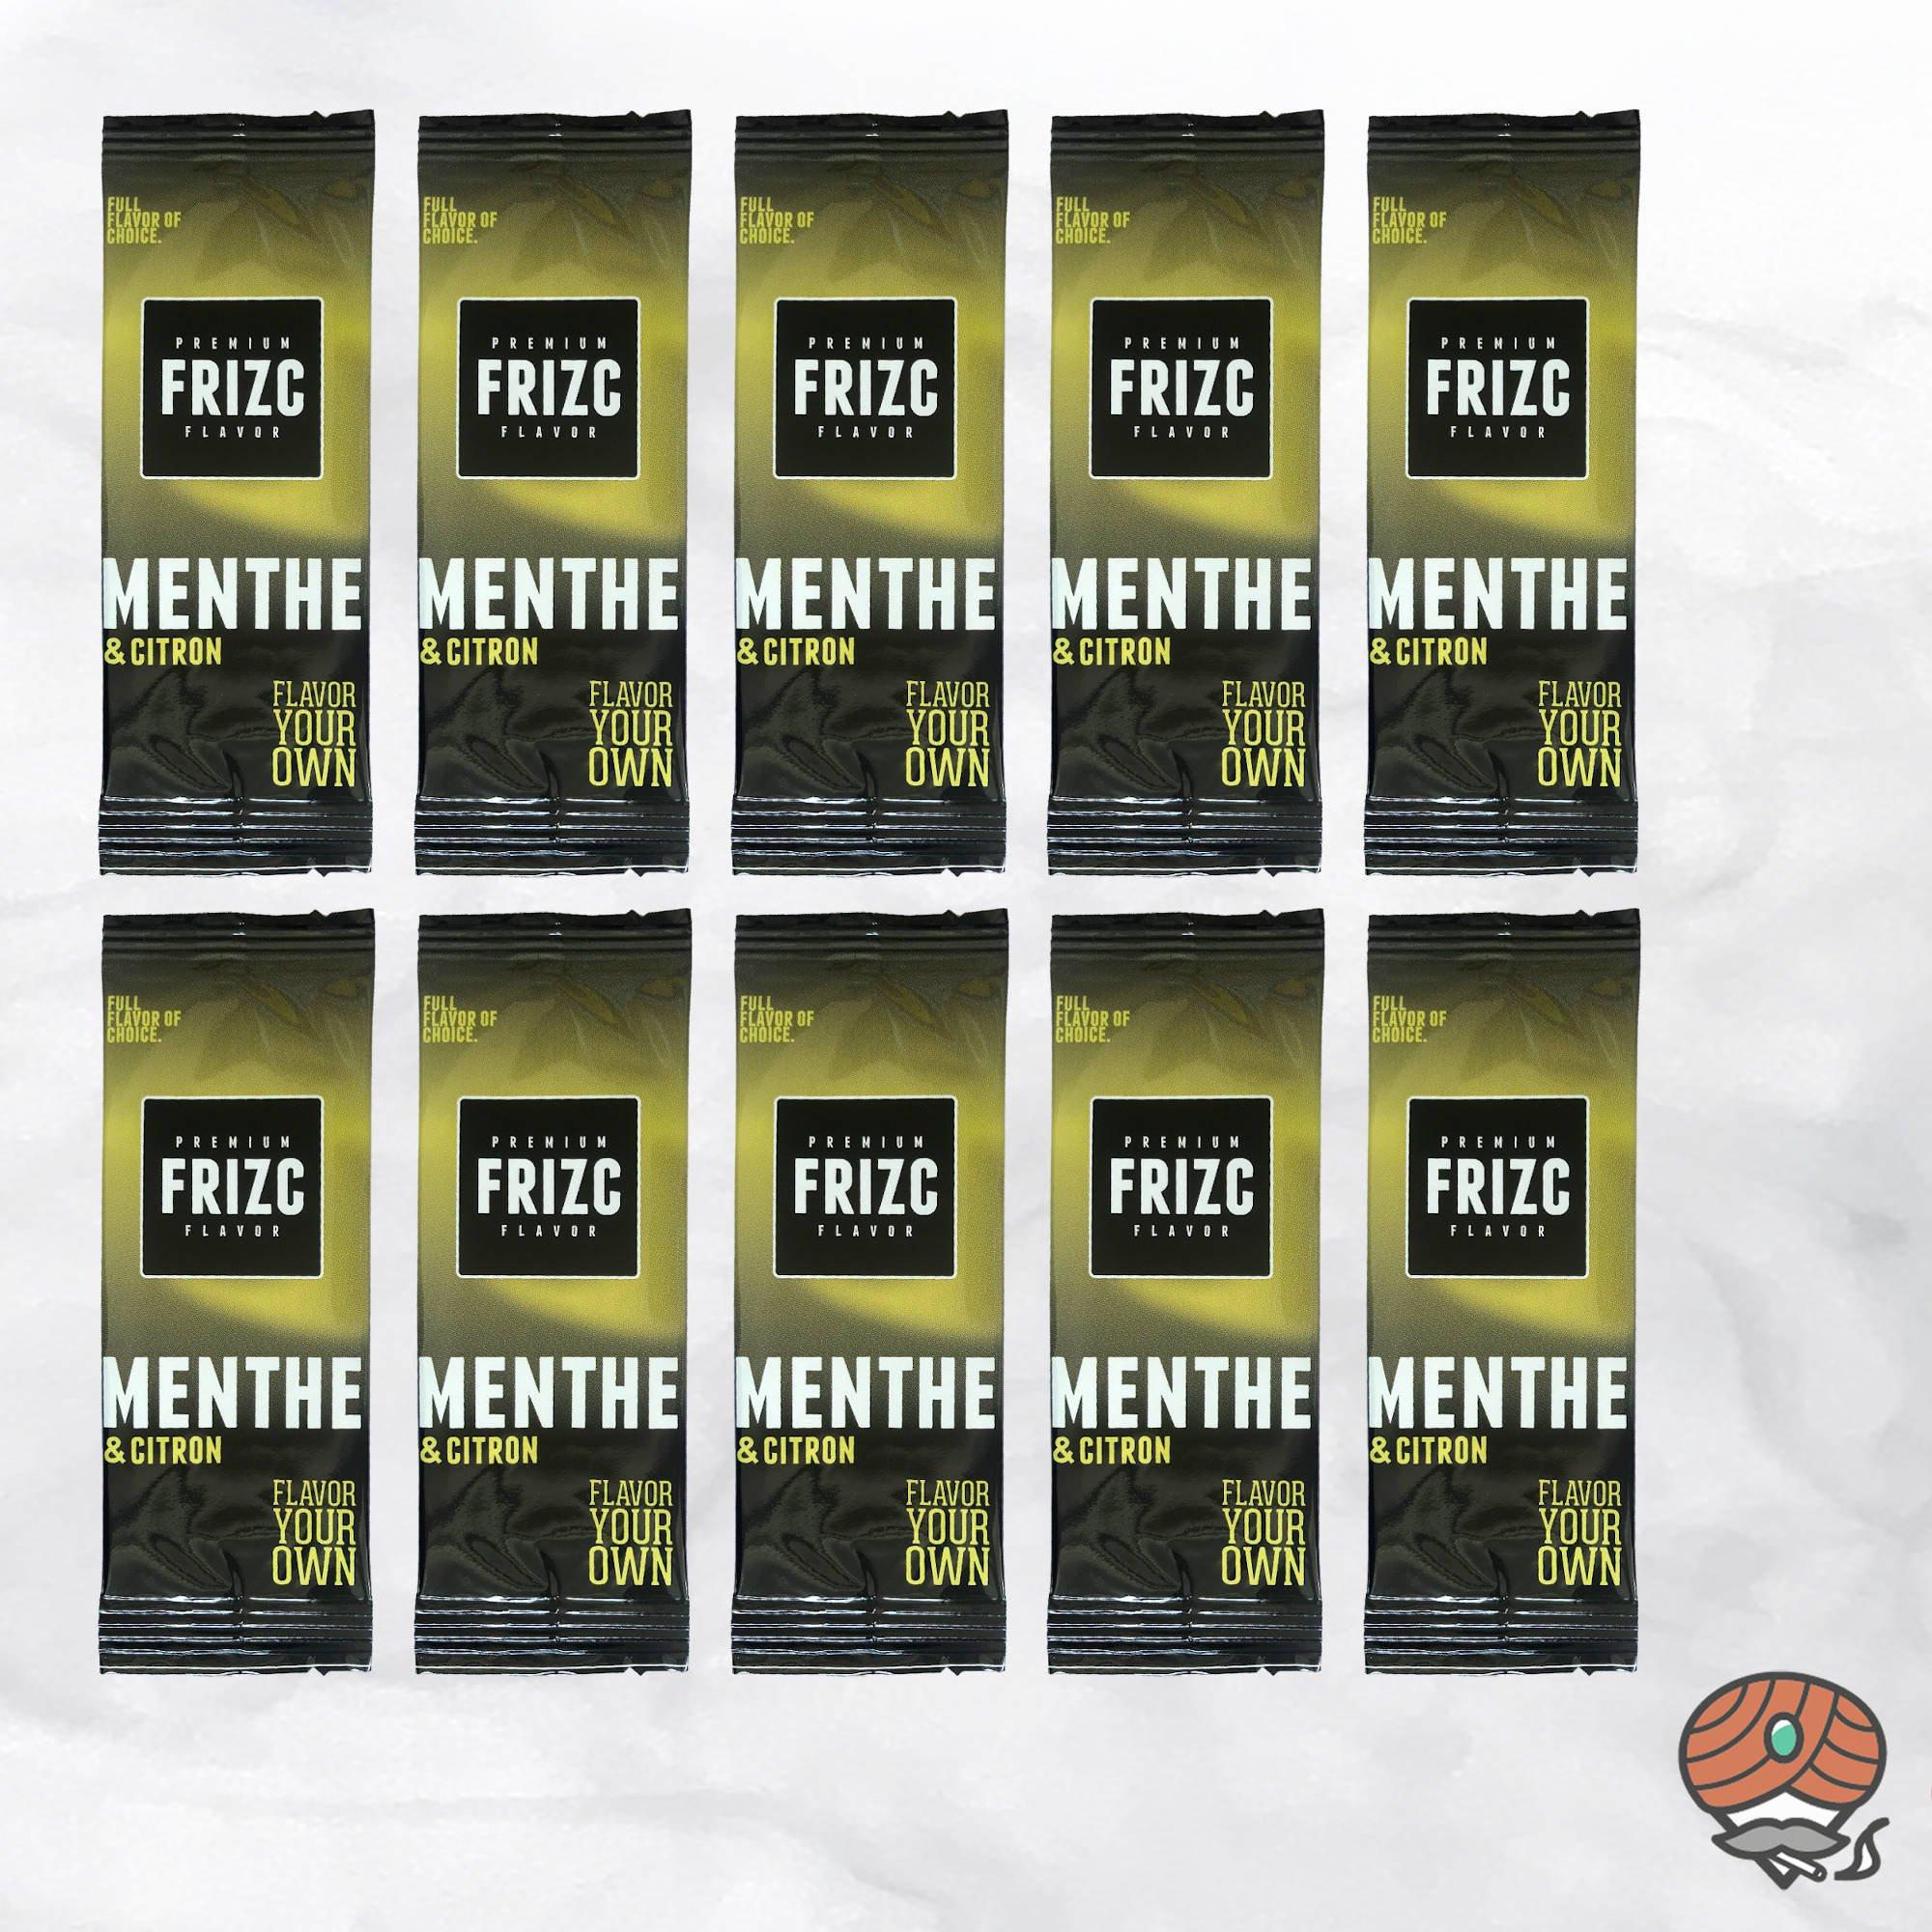 10 x Aromakarte Frizc Menthe & Citron (Menthol & Zitrone) - Premium Flavor Card